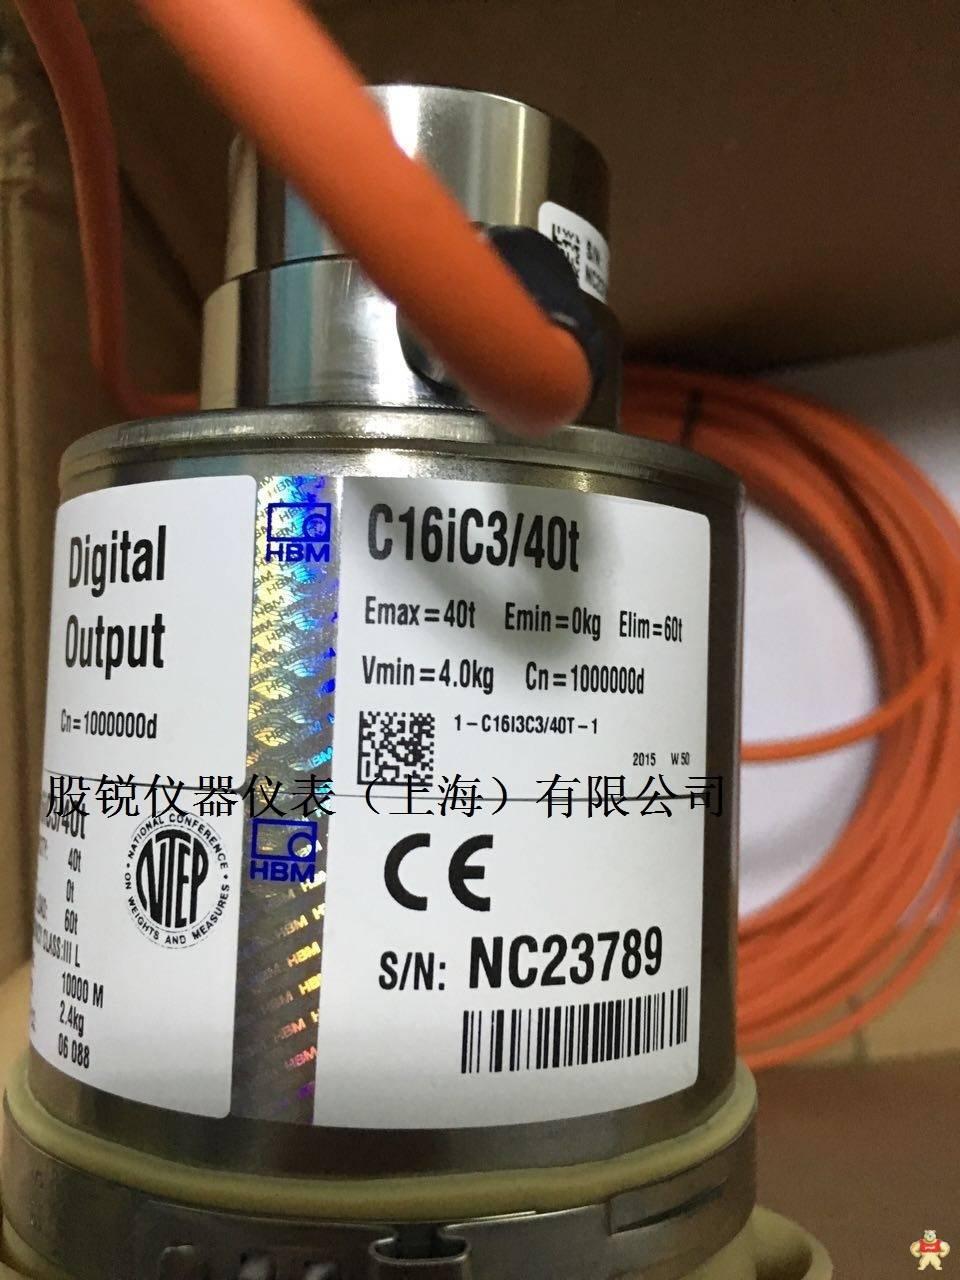 HBM C16A2D1/60T/100T/60T/30T称重传感器 HBM称重传感器,RTNC3/47T称重传感器,MB35C3/550KG称重传感器,HBM RSCC/50KG,HBM C16IC3/40T称重传感器